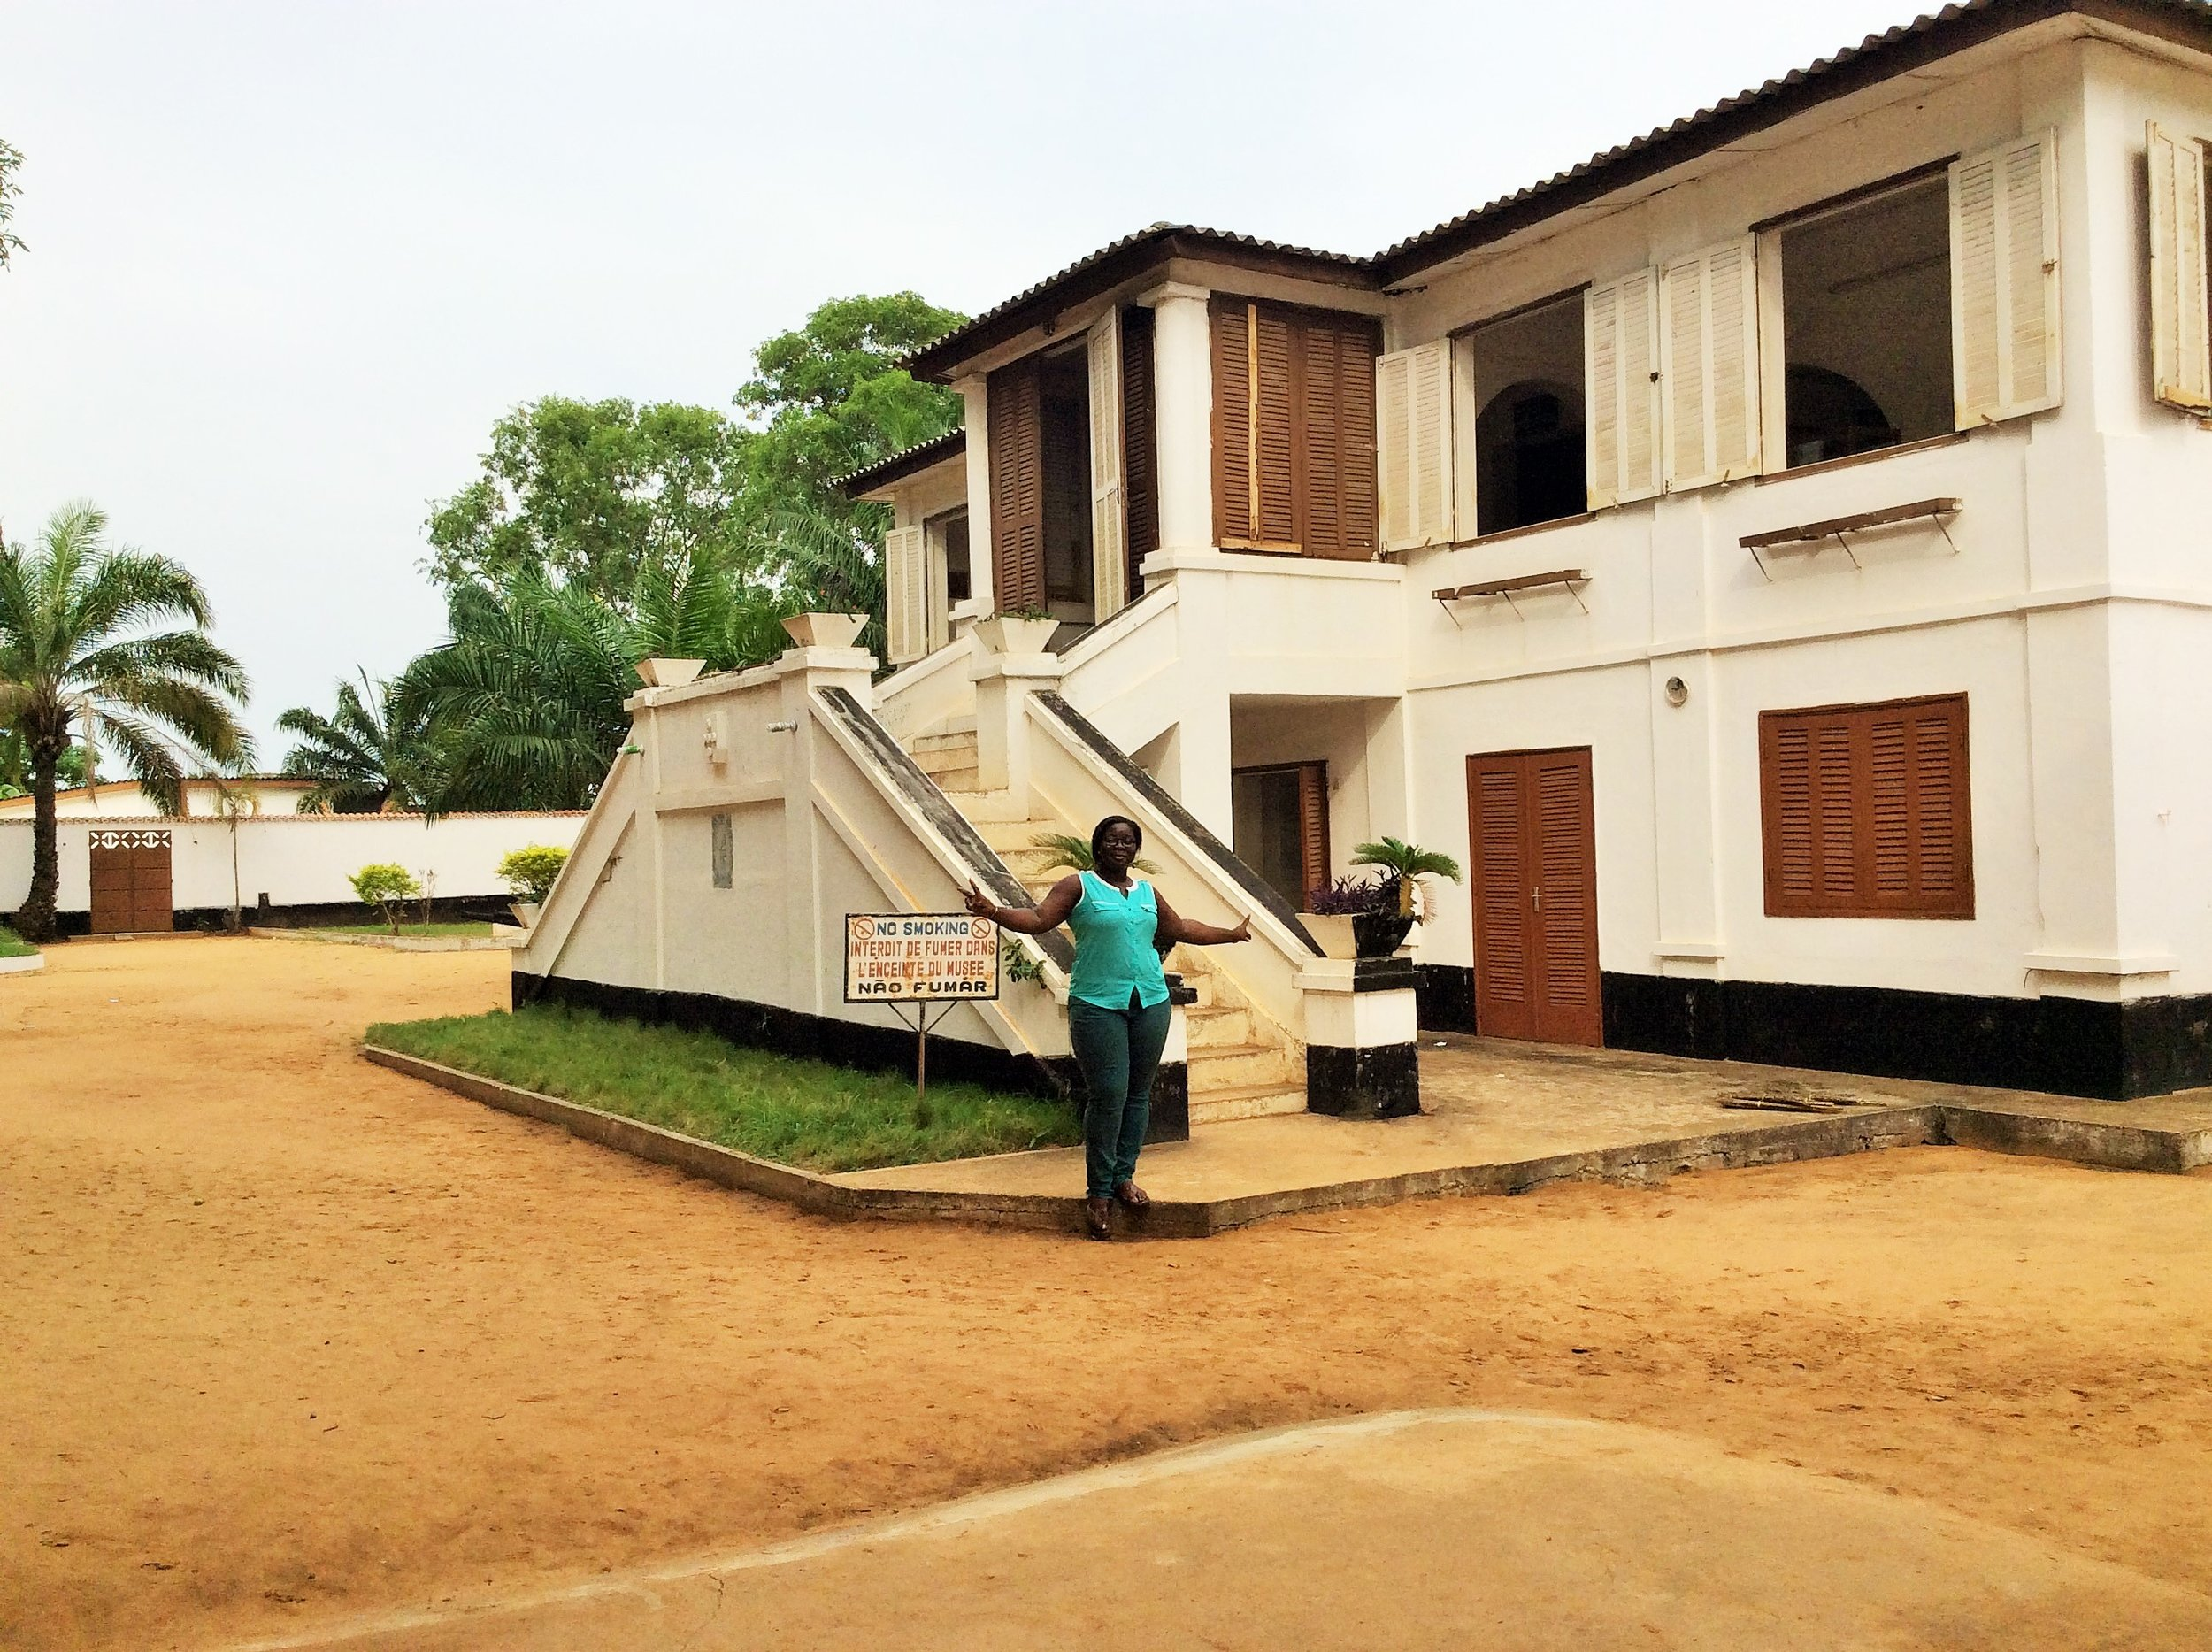 OUIDAH MUSEUM OF HISTORY.